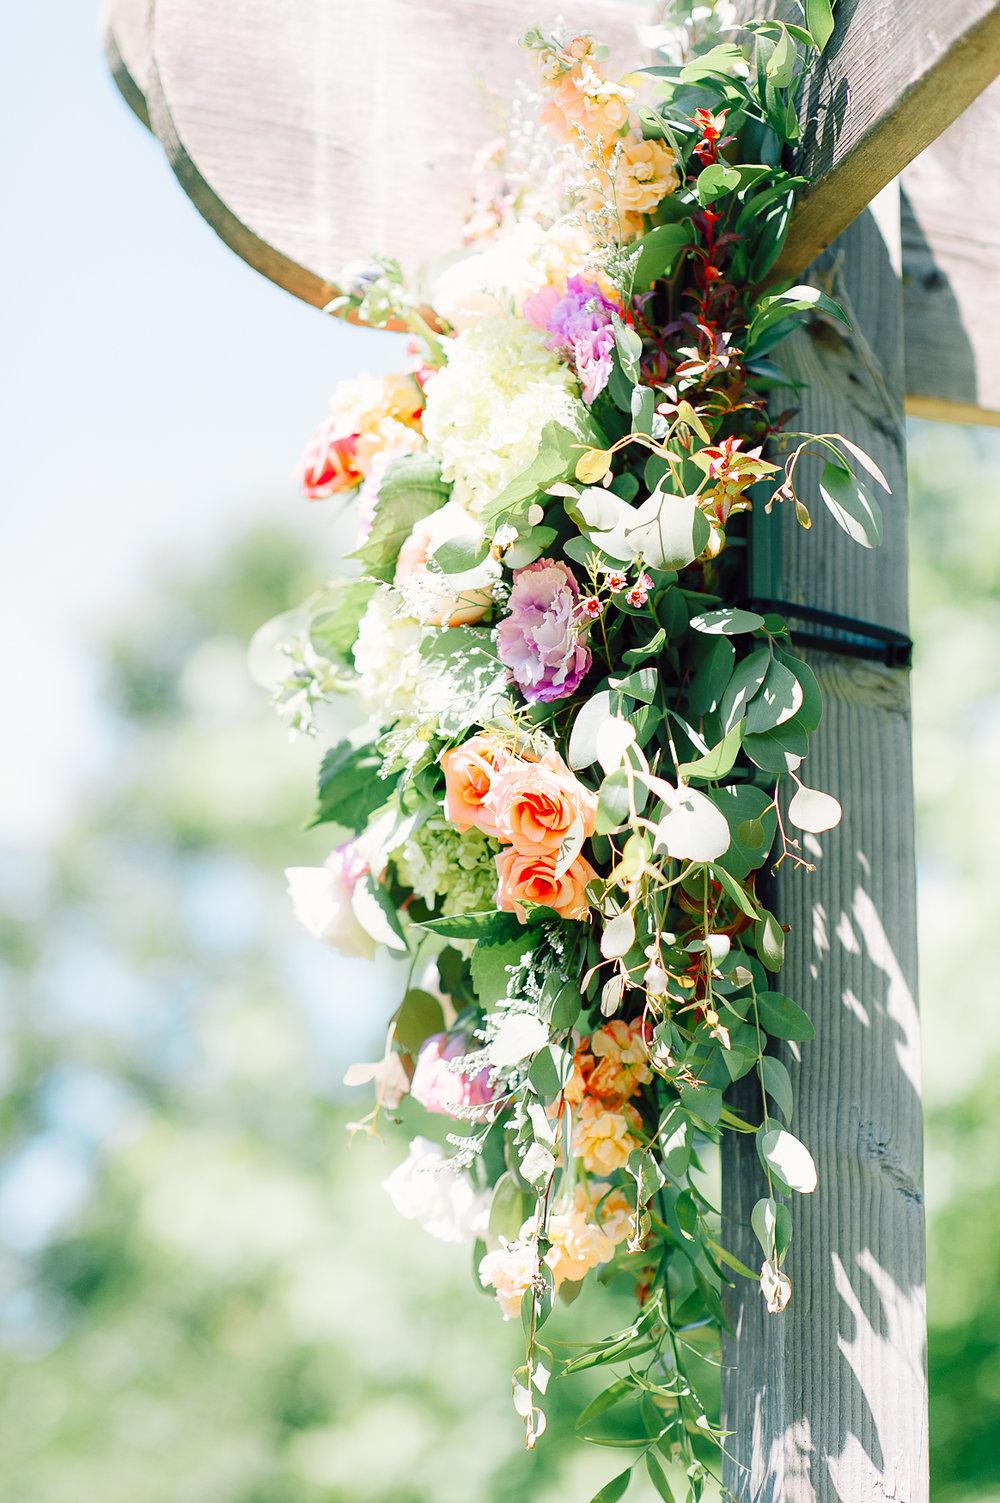 virginiawedding_theGlasgowFarm_rusticwedding_fredericksburg_youseephotography_CarolineDale (30).jpg